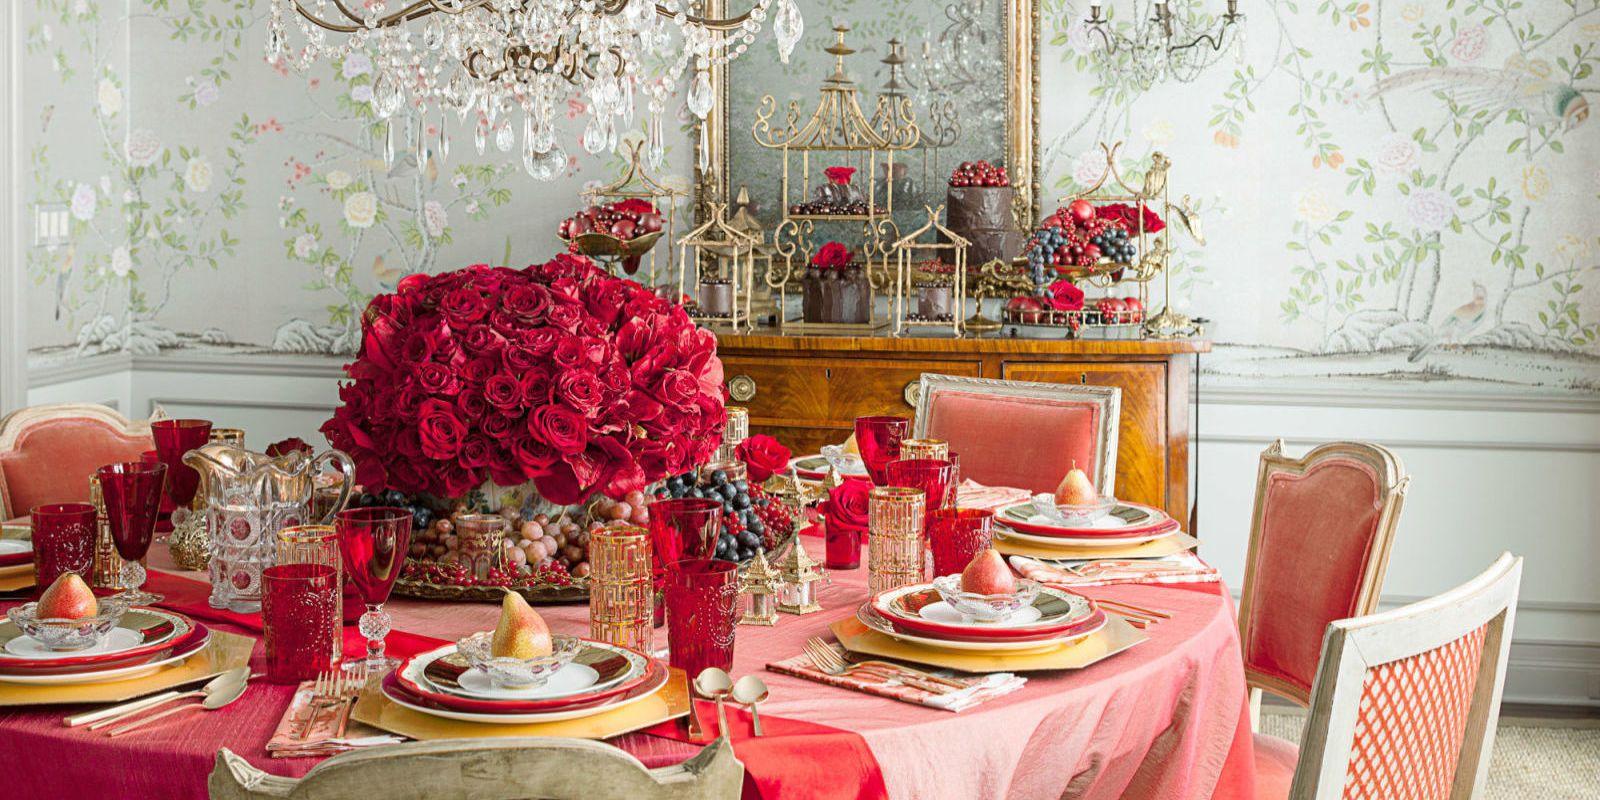 Romantic Table Ideas ... & Table Decorating Ideas - Elegant Table Decor and Settings